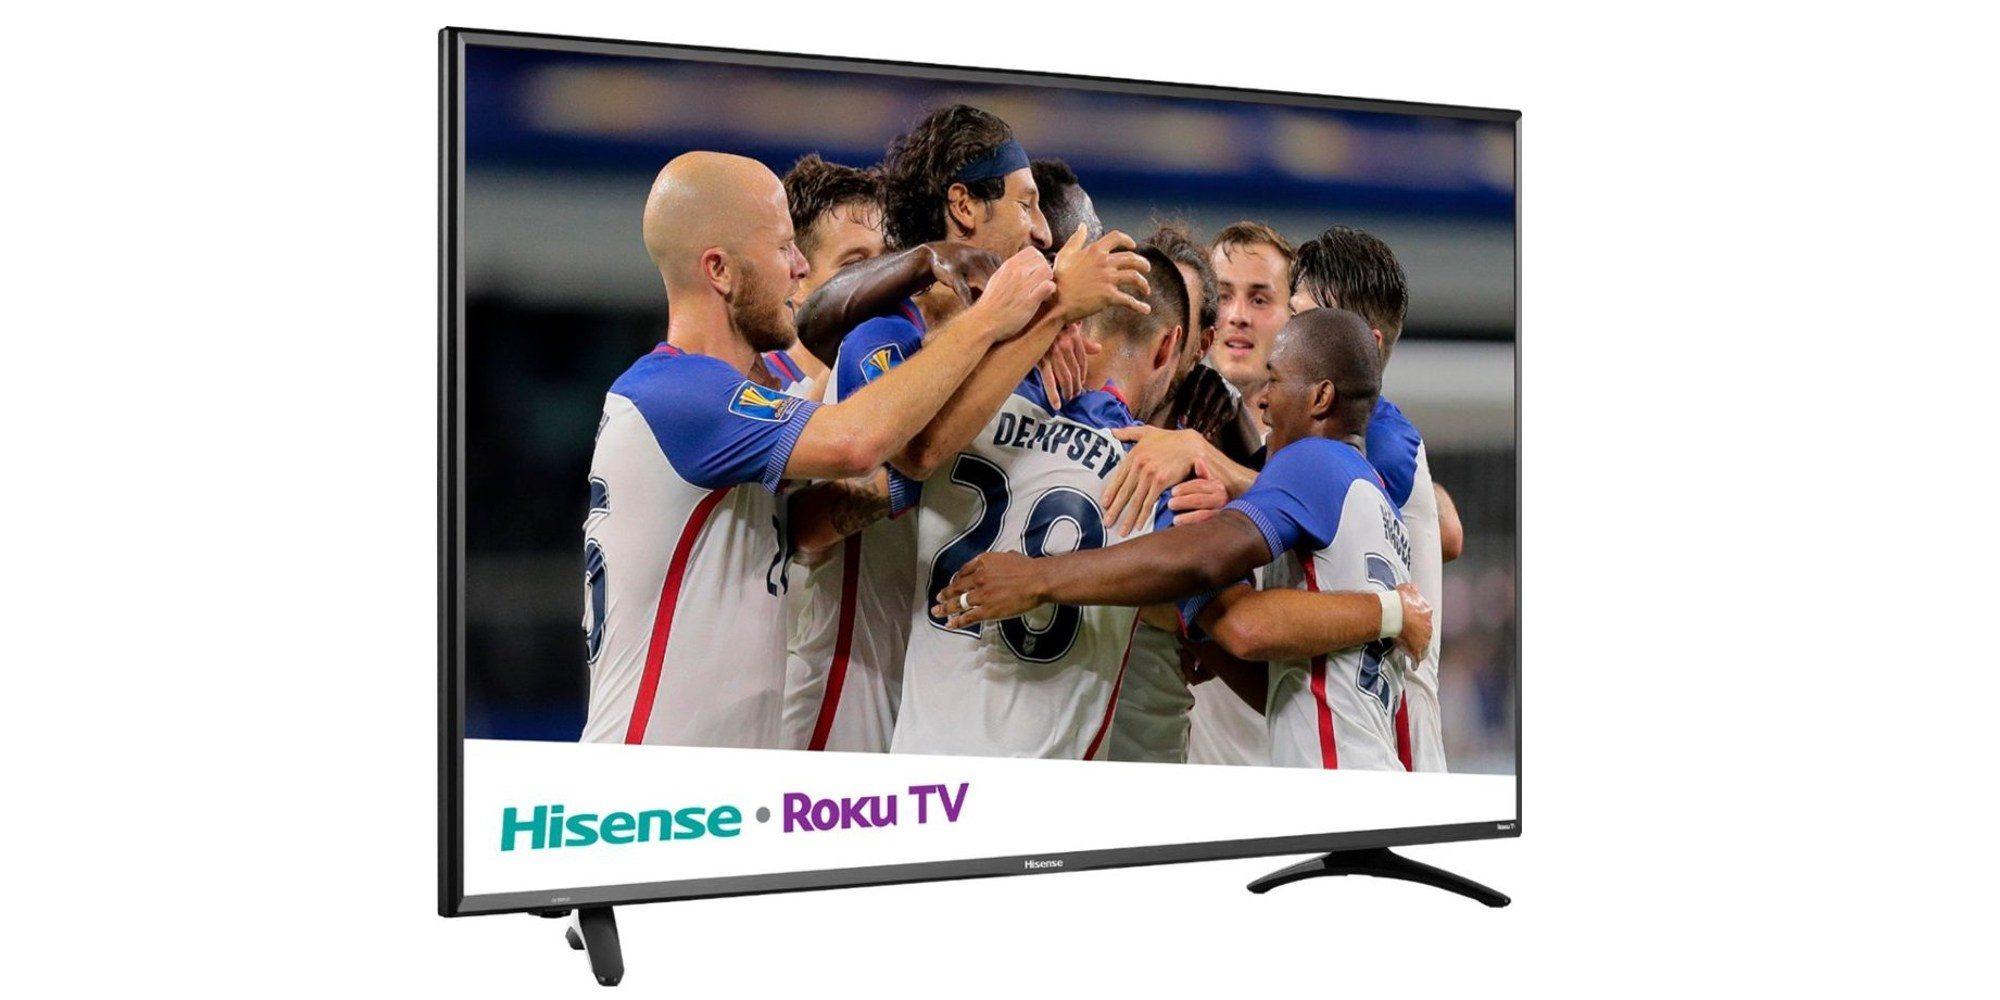 9to5Toys Letzter Anruf: Hisense 55 ″ 4K Roku UHDTV 300 $, TP-Link Smart Bulb 2-Pack 25 $, Samsung Laserdrucker 45 $, mehr